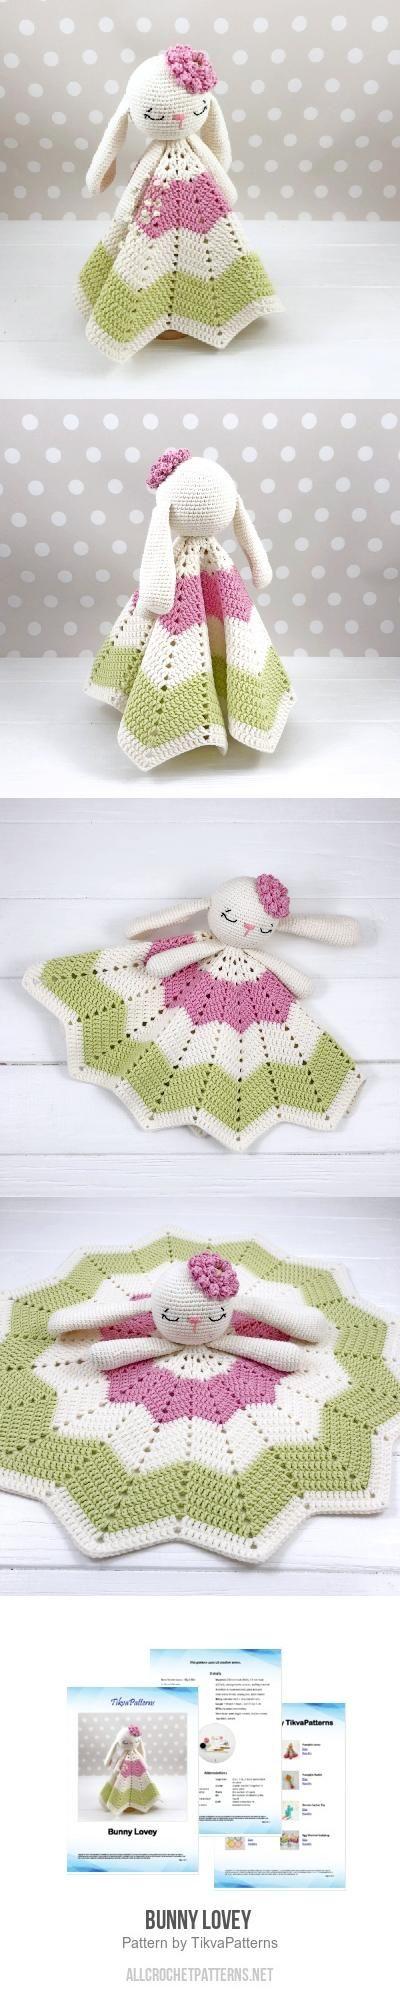 1391 best Bonecas images on Pinterest | Amigurumi patterns, Crochet ...